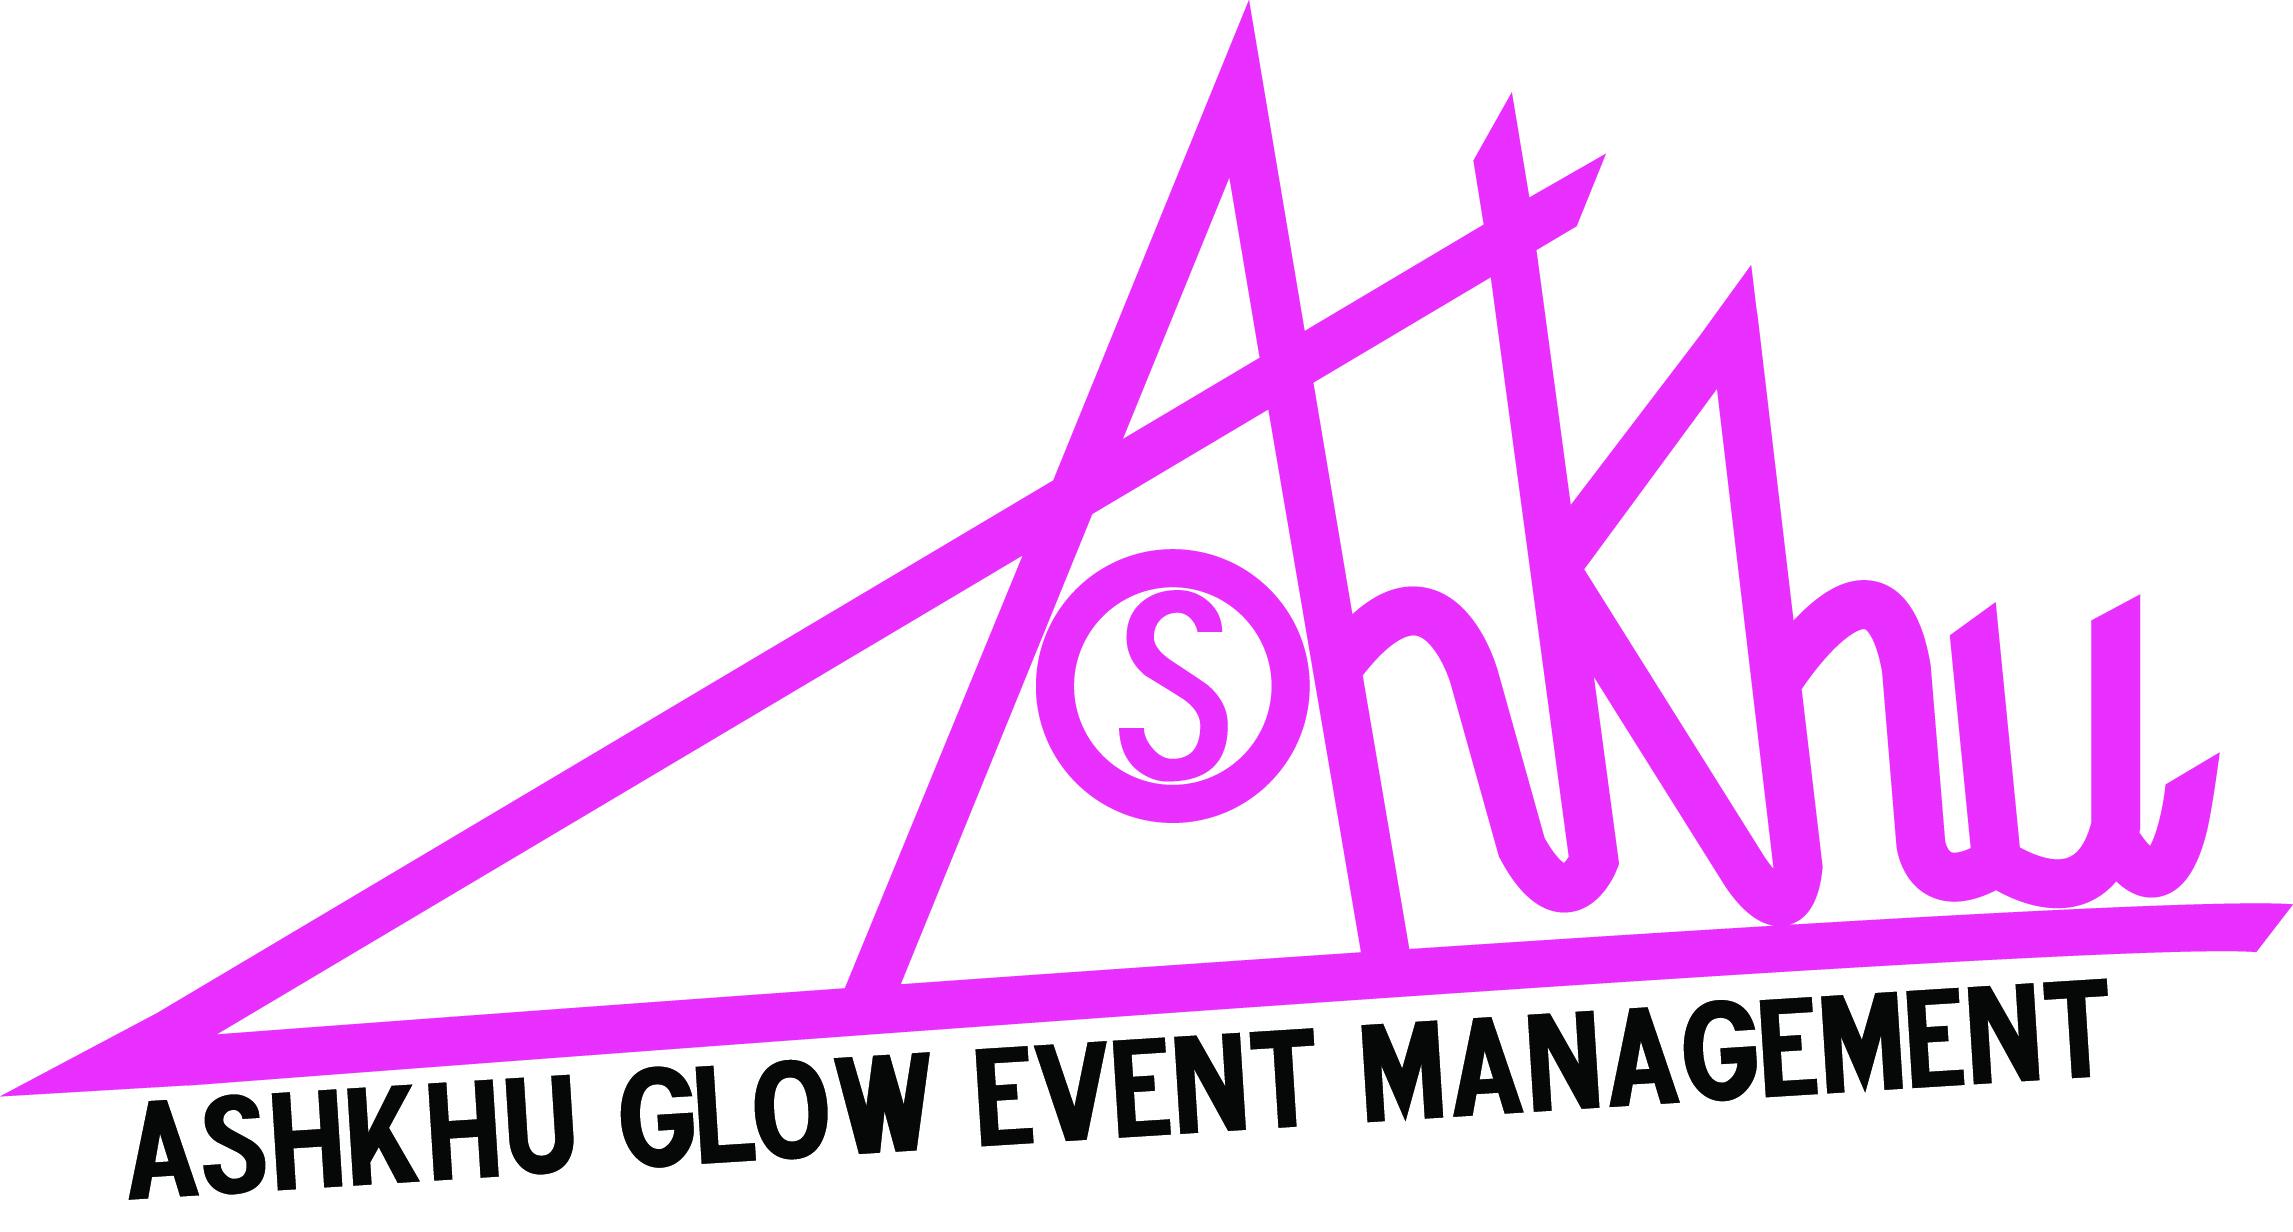 Ashkhu Glow Event Management